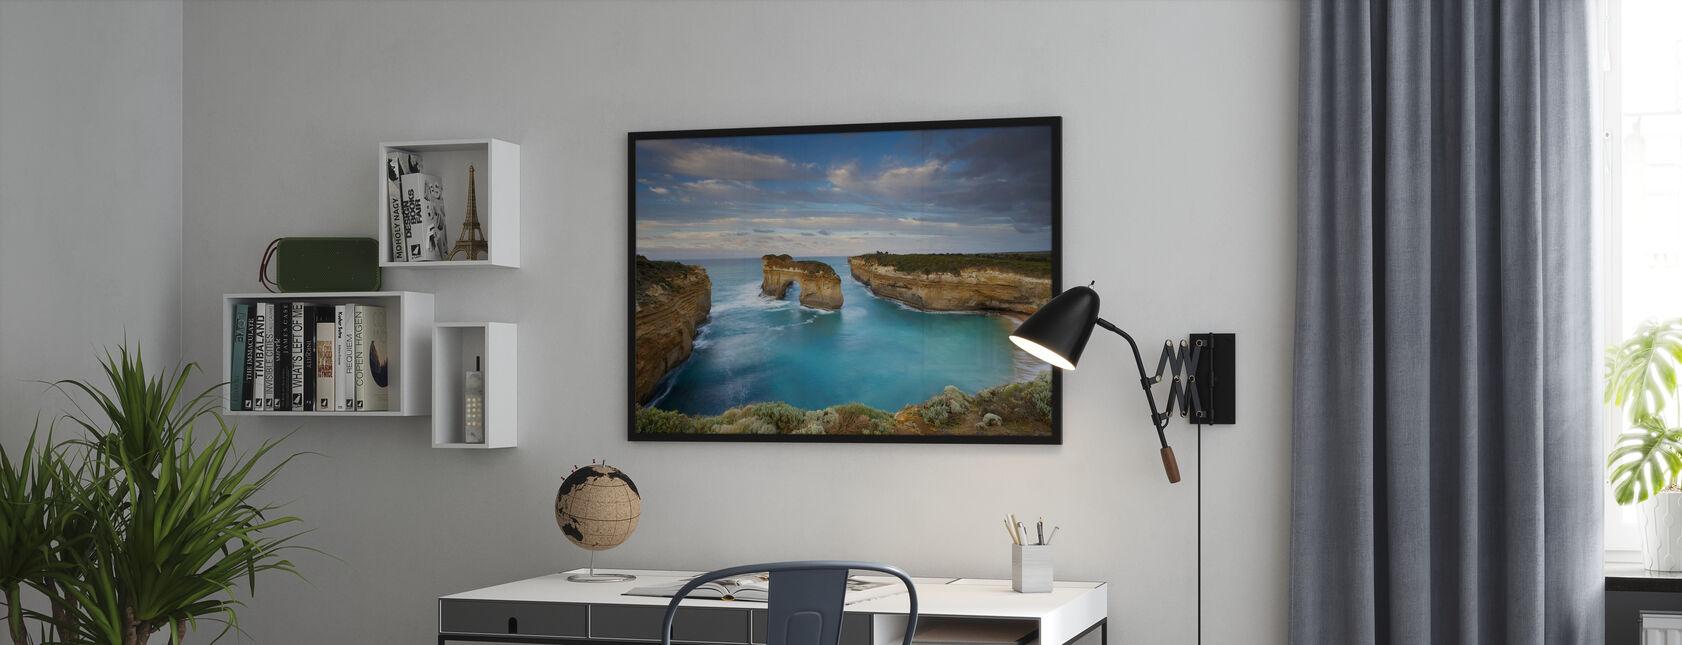 Loch Ard Gorge - Framed print - Office